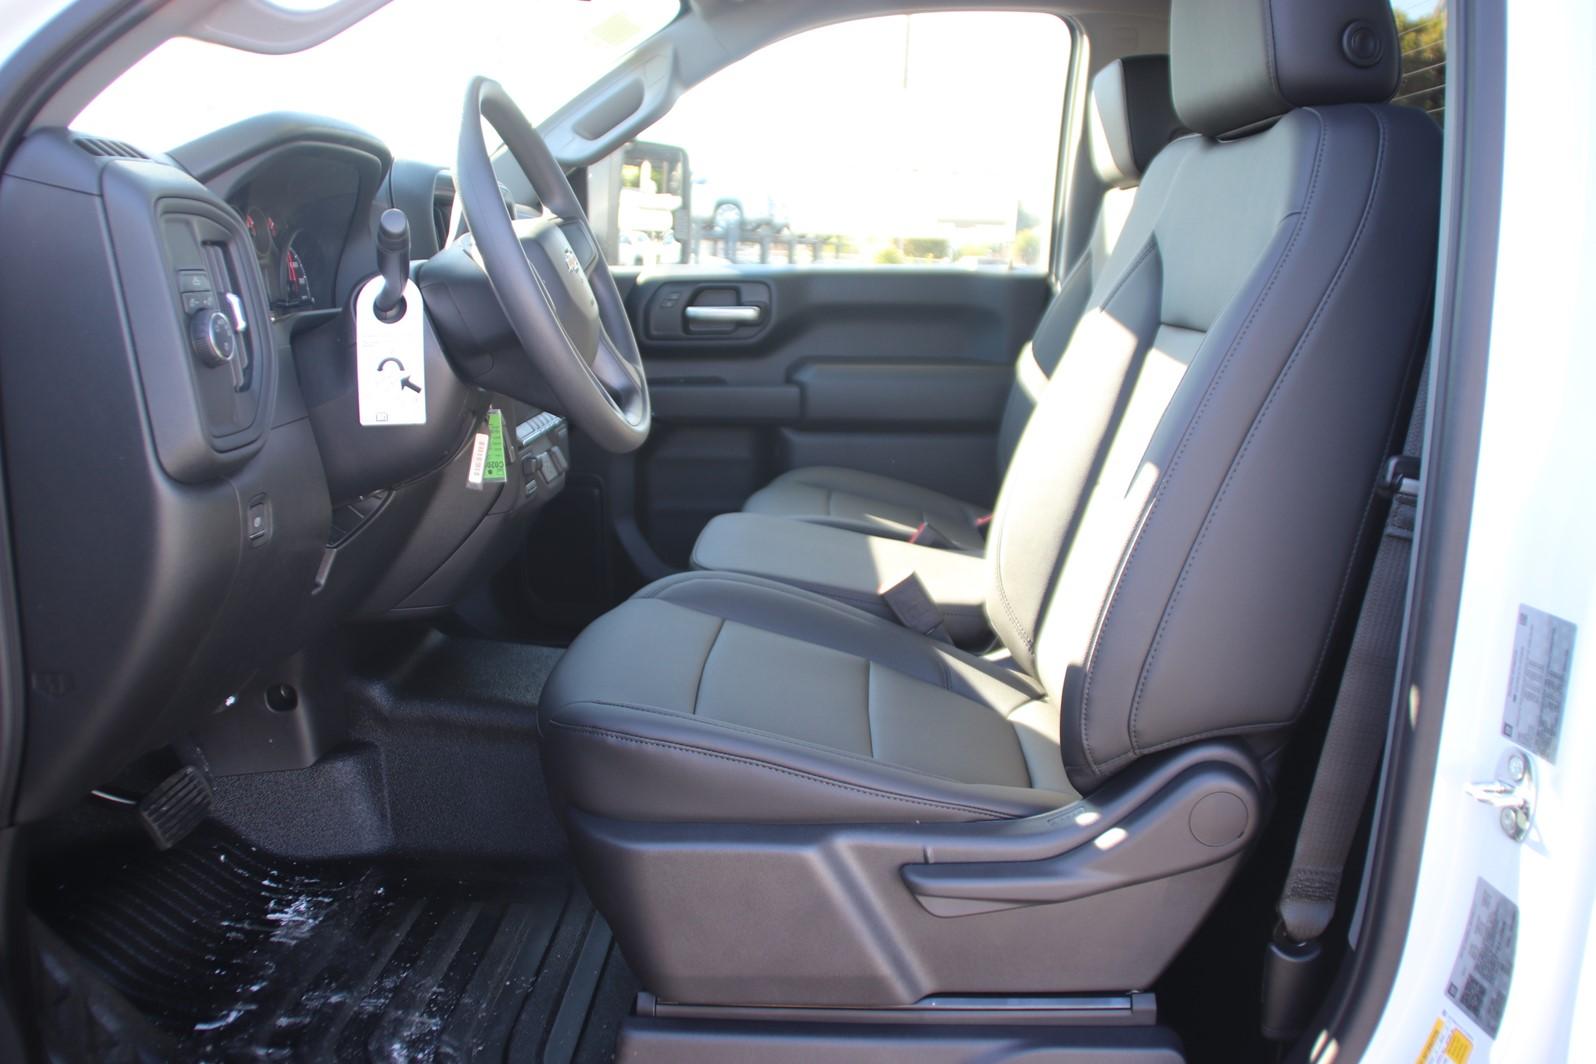 2020 Chevrolet Silverado 2500 Regular Cab 4x2, Knapheide Steel Service Body #C02051 - photo 7